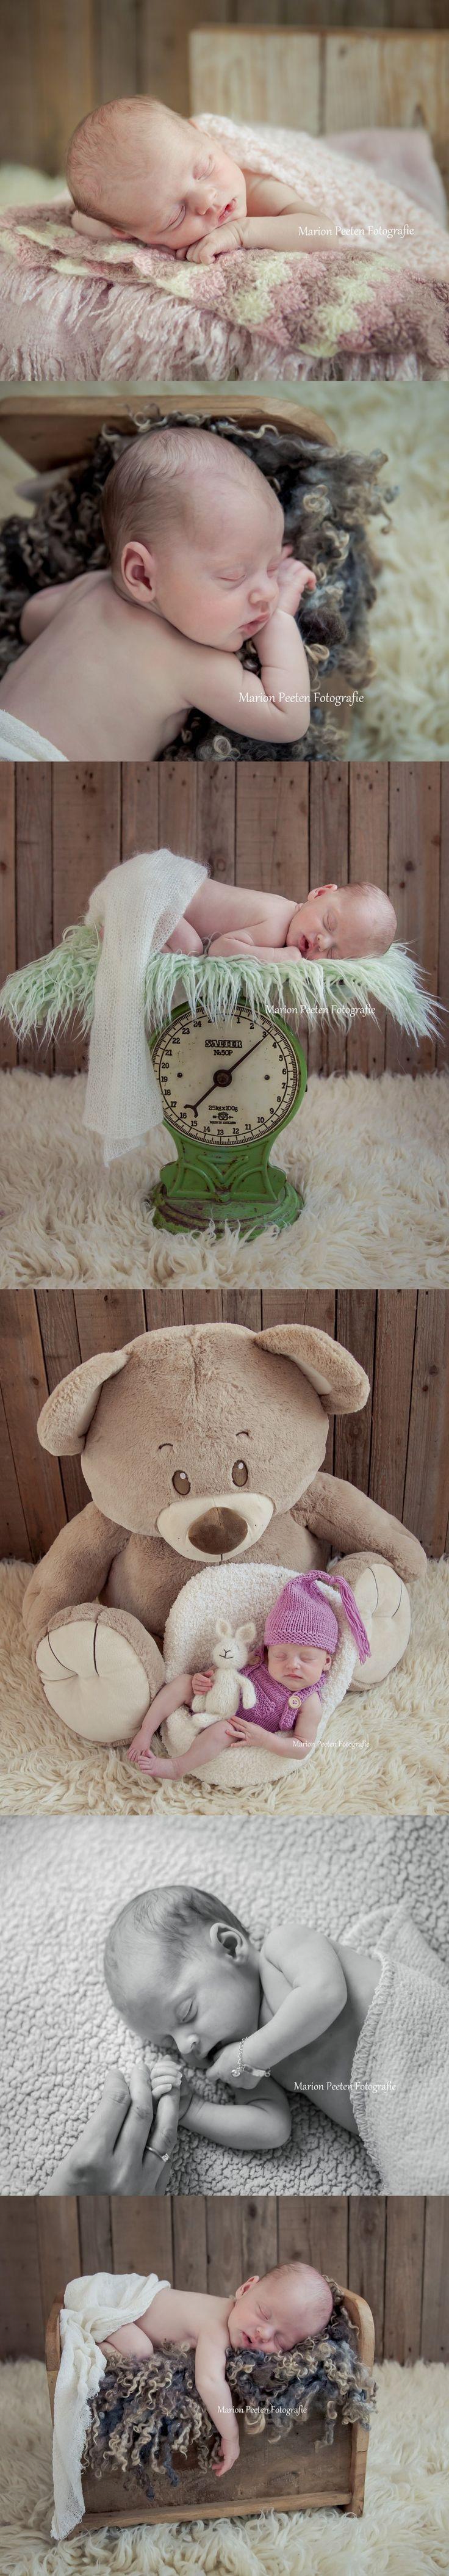 newborns by marion peeten#newborns by marion peeten photography#studio photography#love#newborn love#newborn with huge bear#